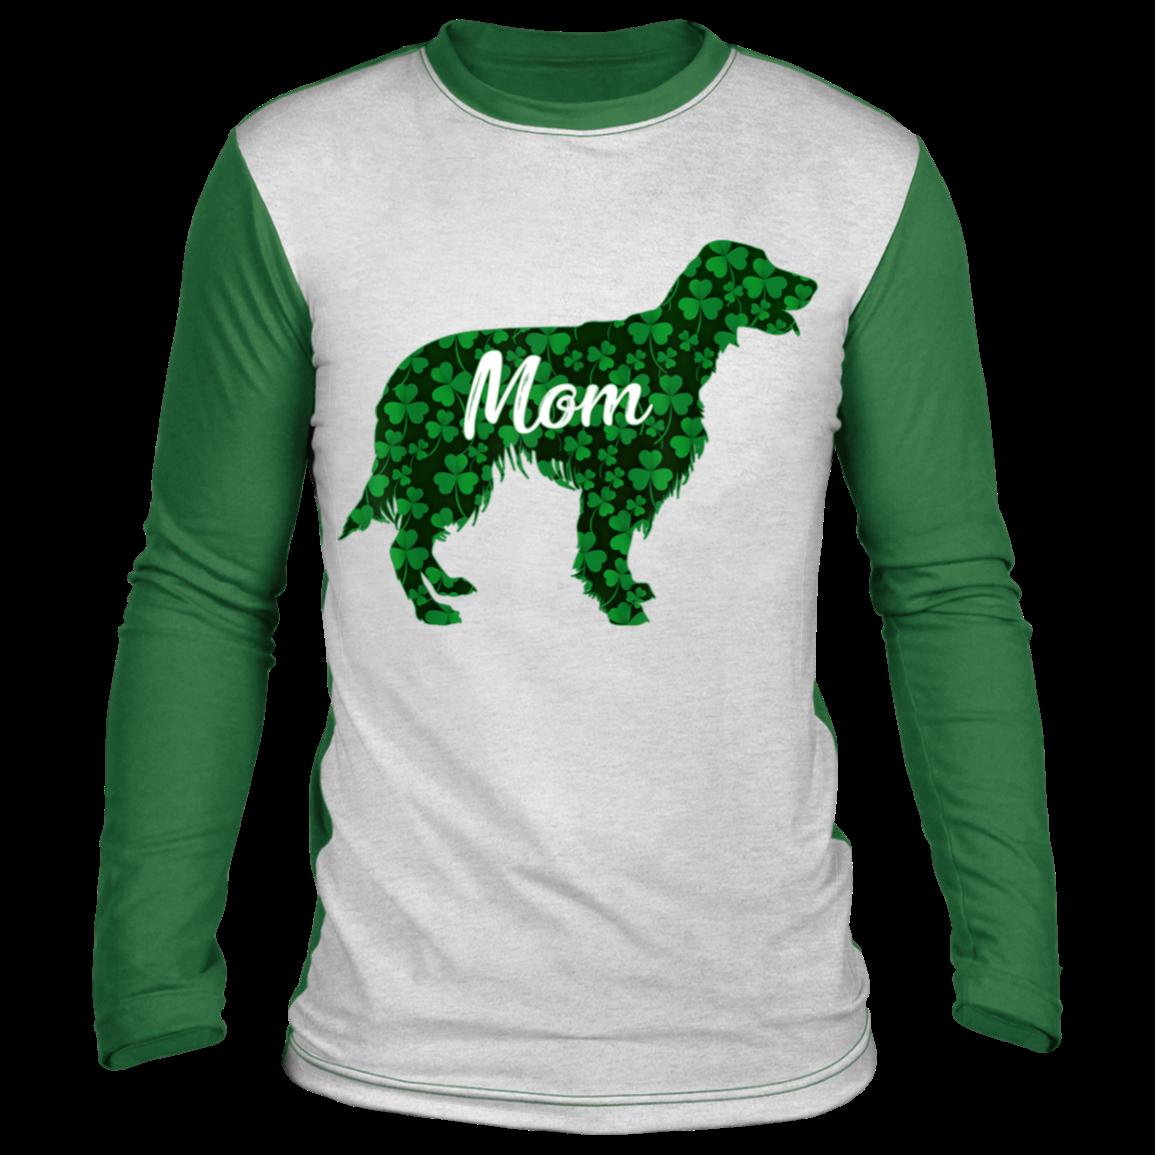 I Got My First Irish Setter Tee Shirt Irish Setter T Shirt